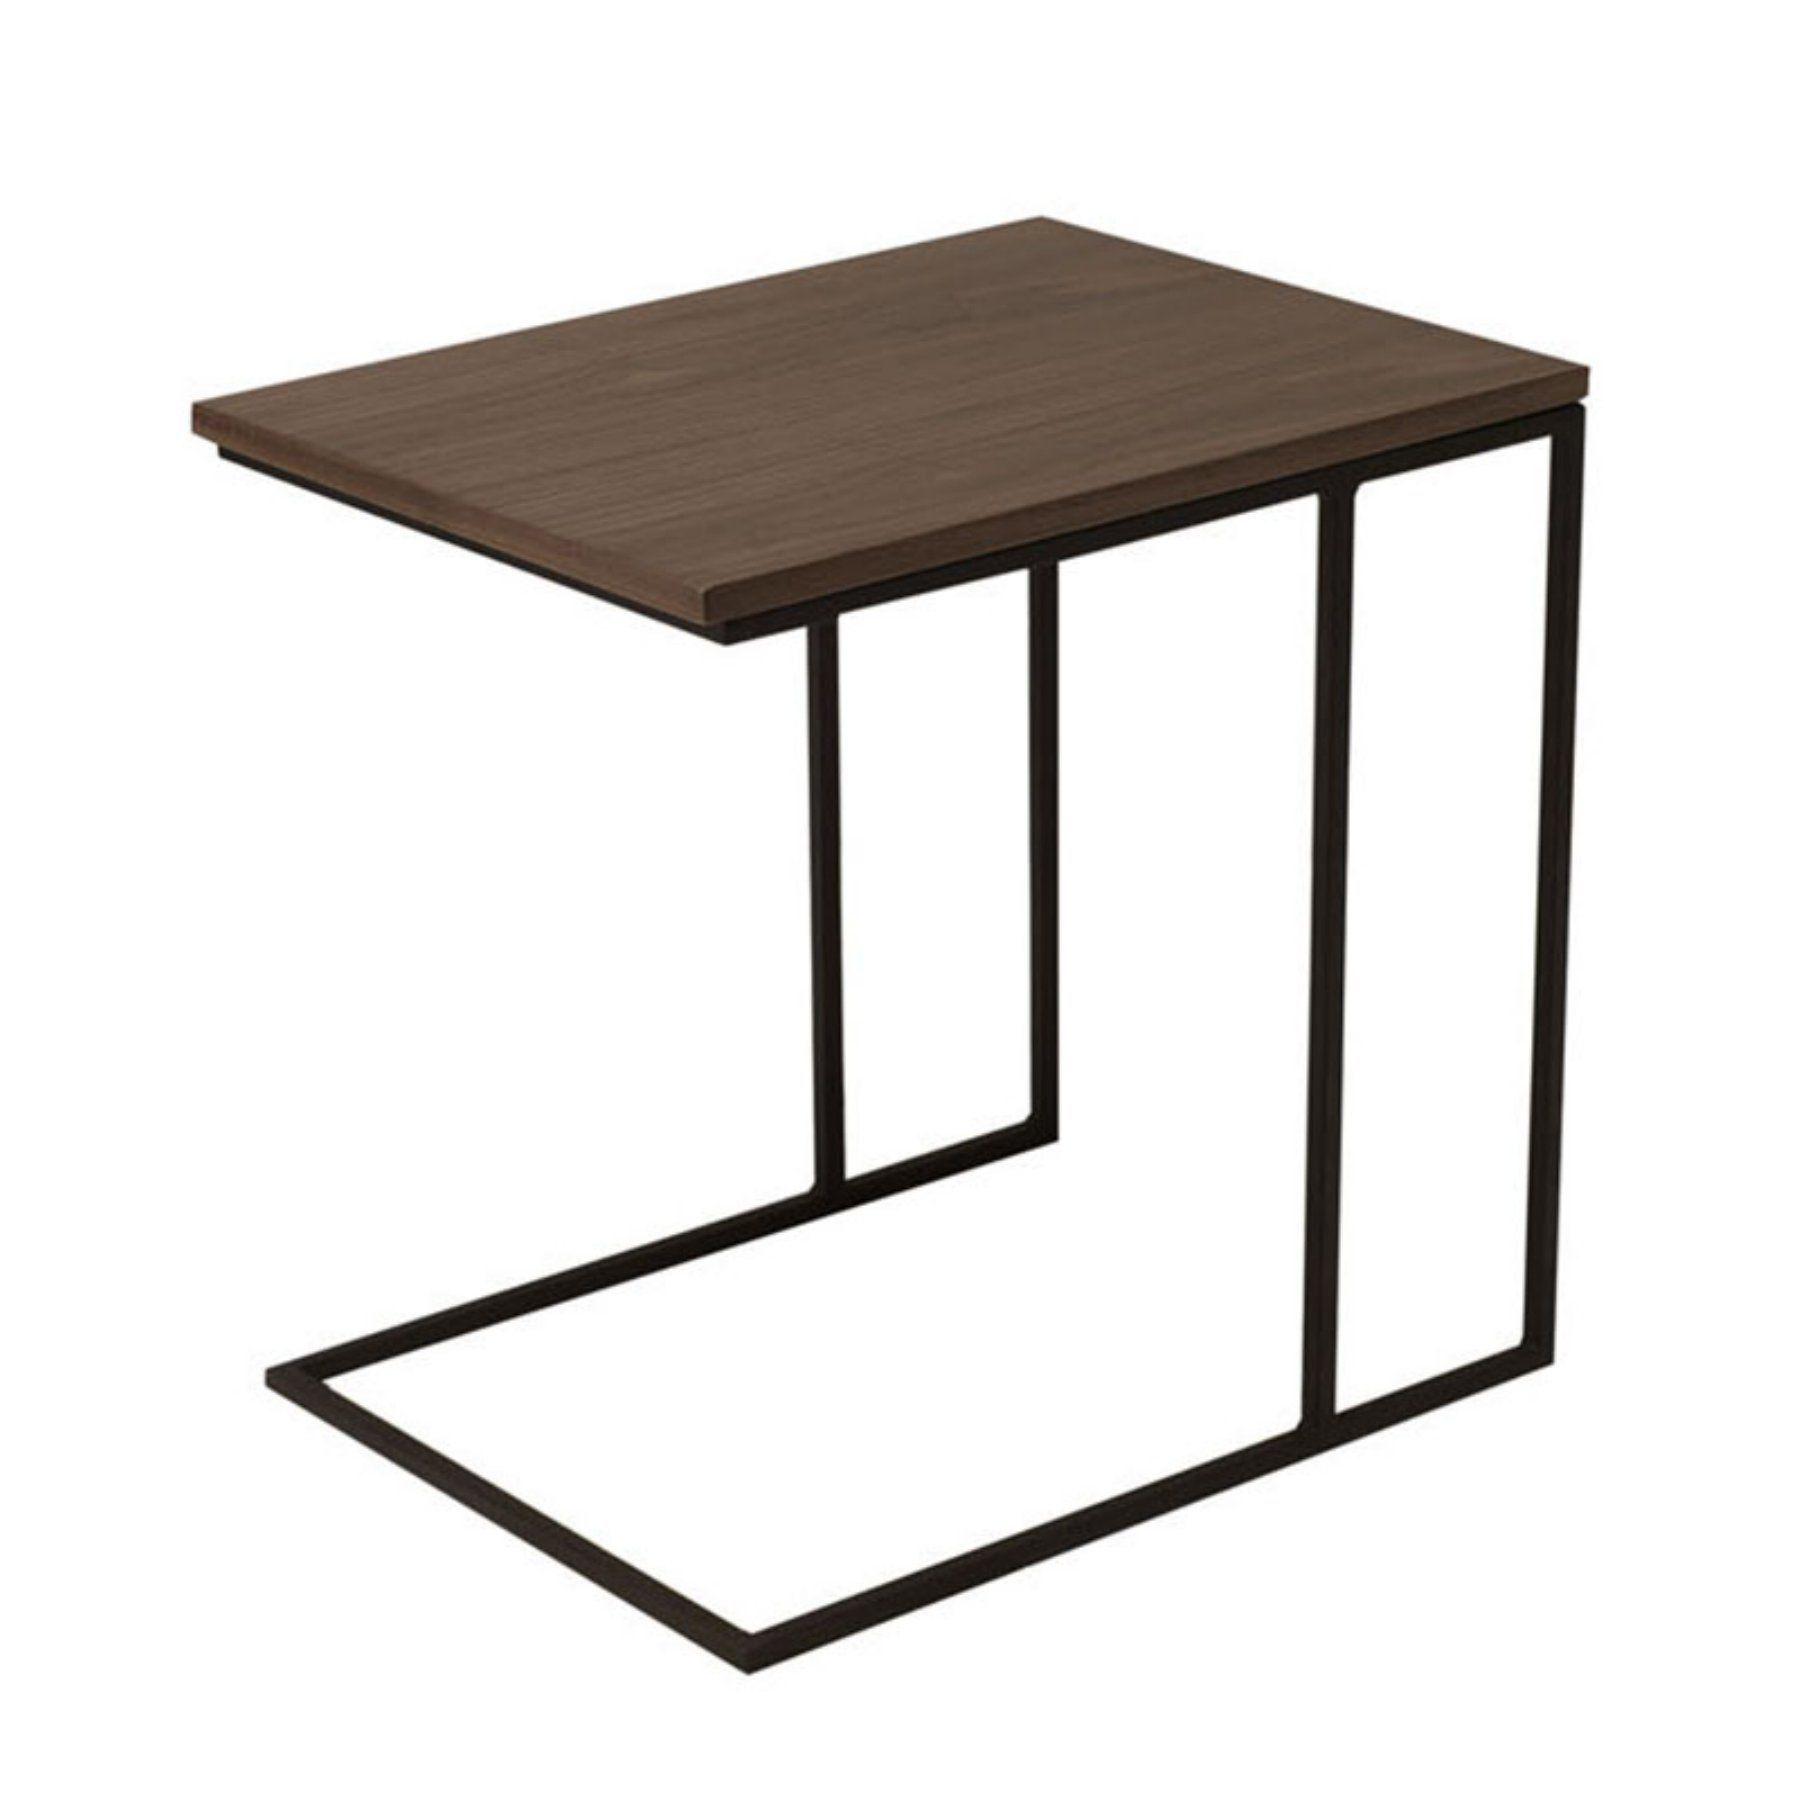 modloft frederik side table 1319041 products